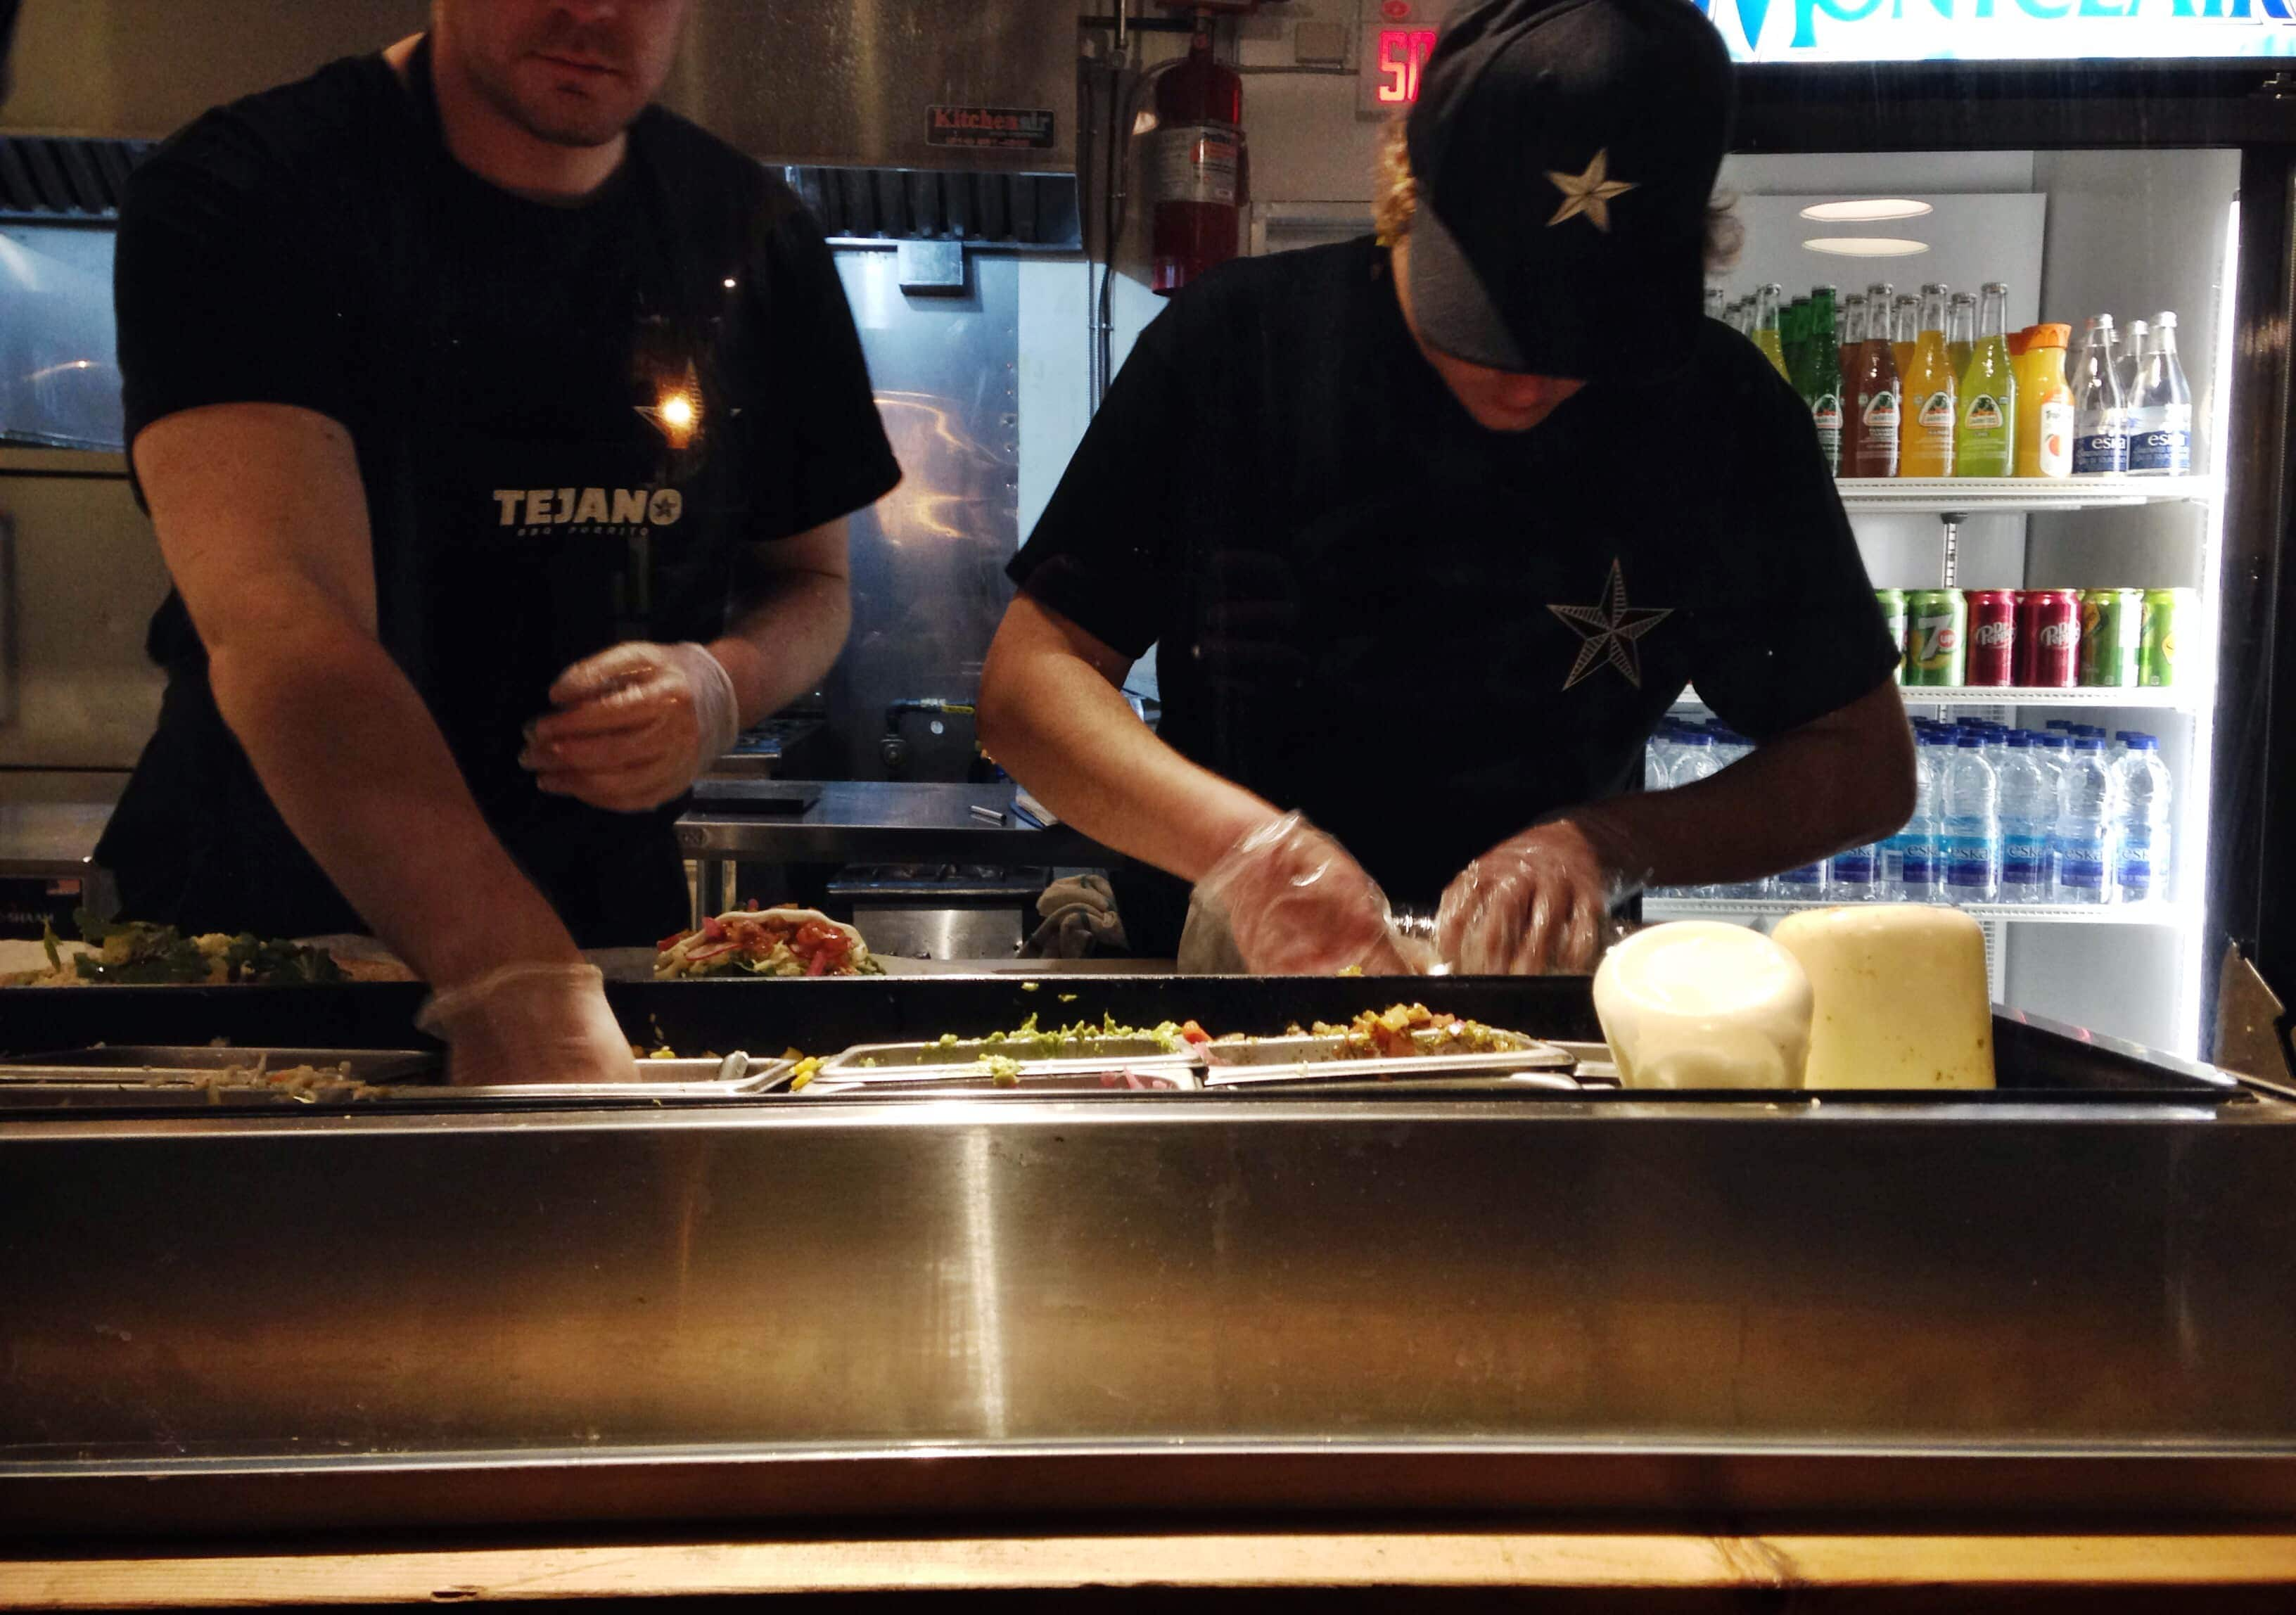 Tejano BBQ Burrito Old montreal restaurant